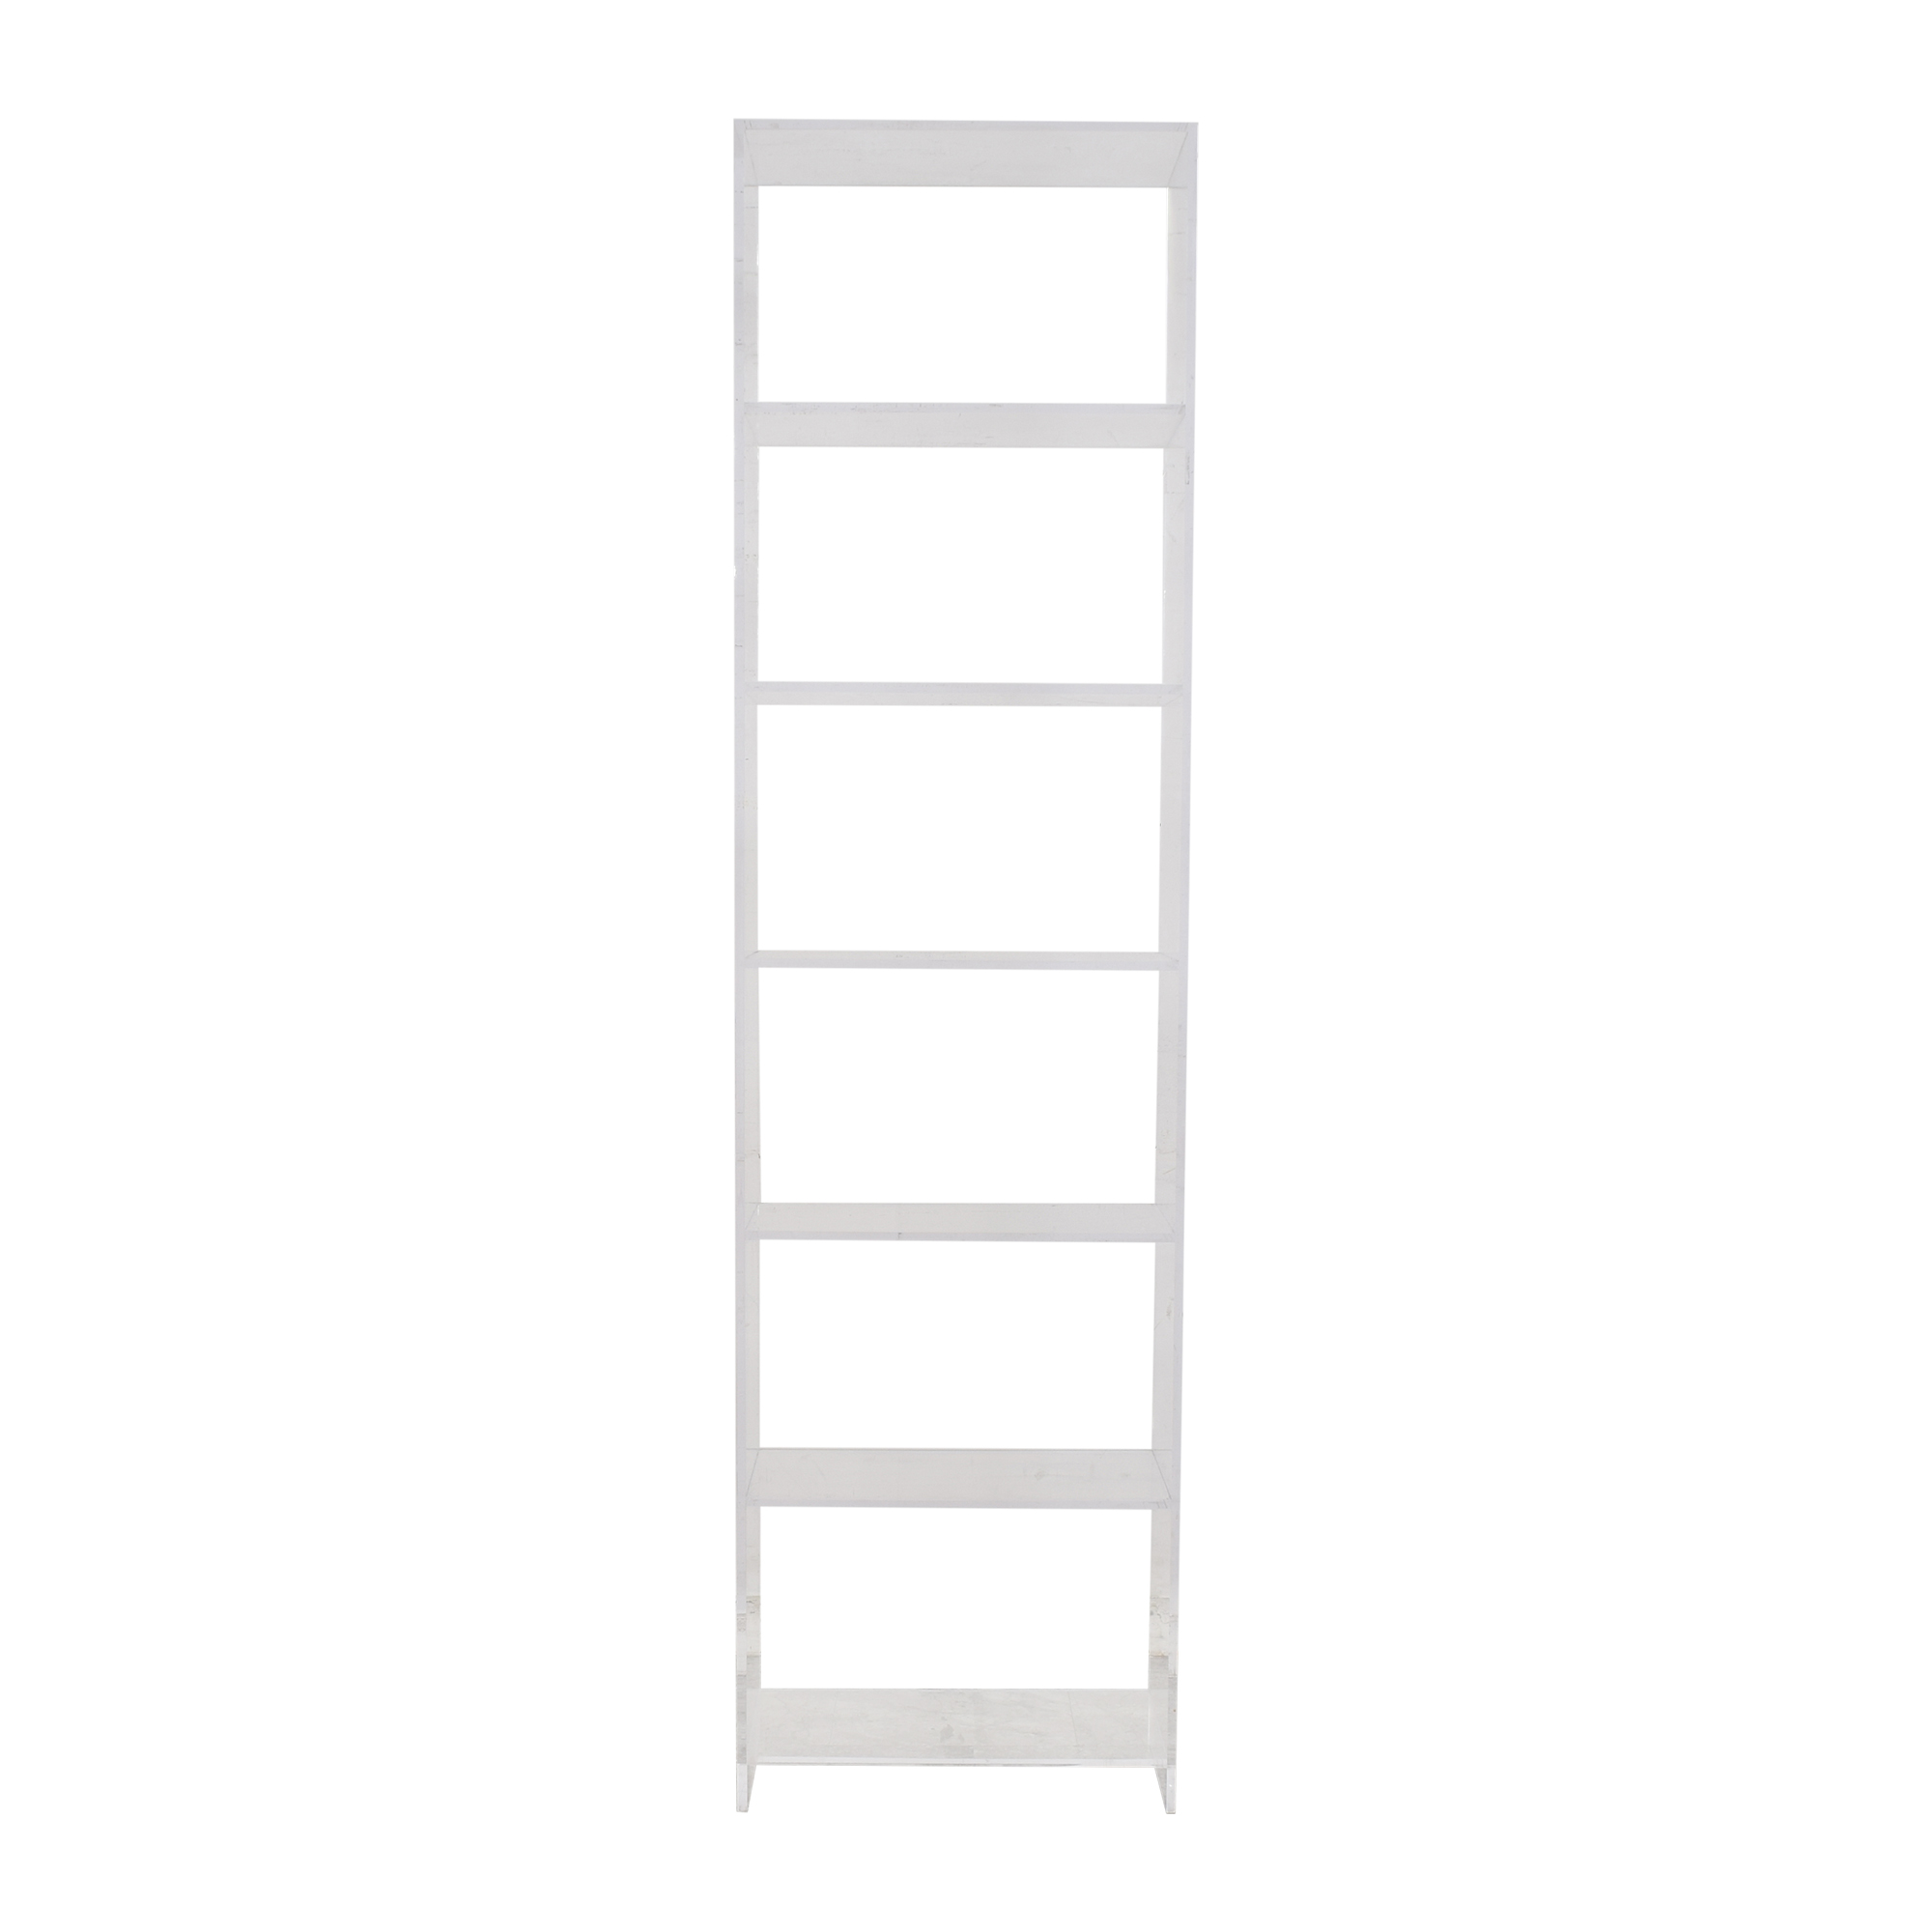 Custom Translucent Bookcase Bookcases & Shelving